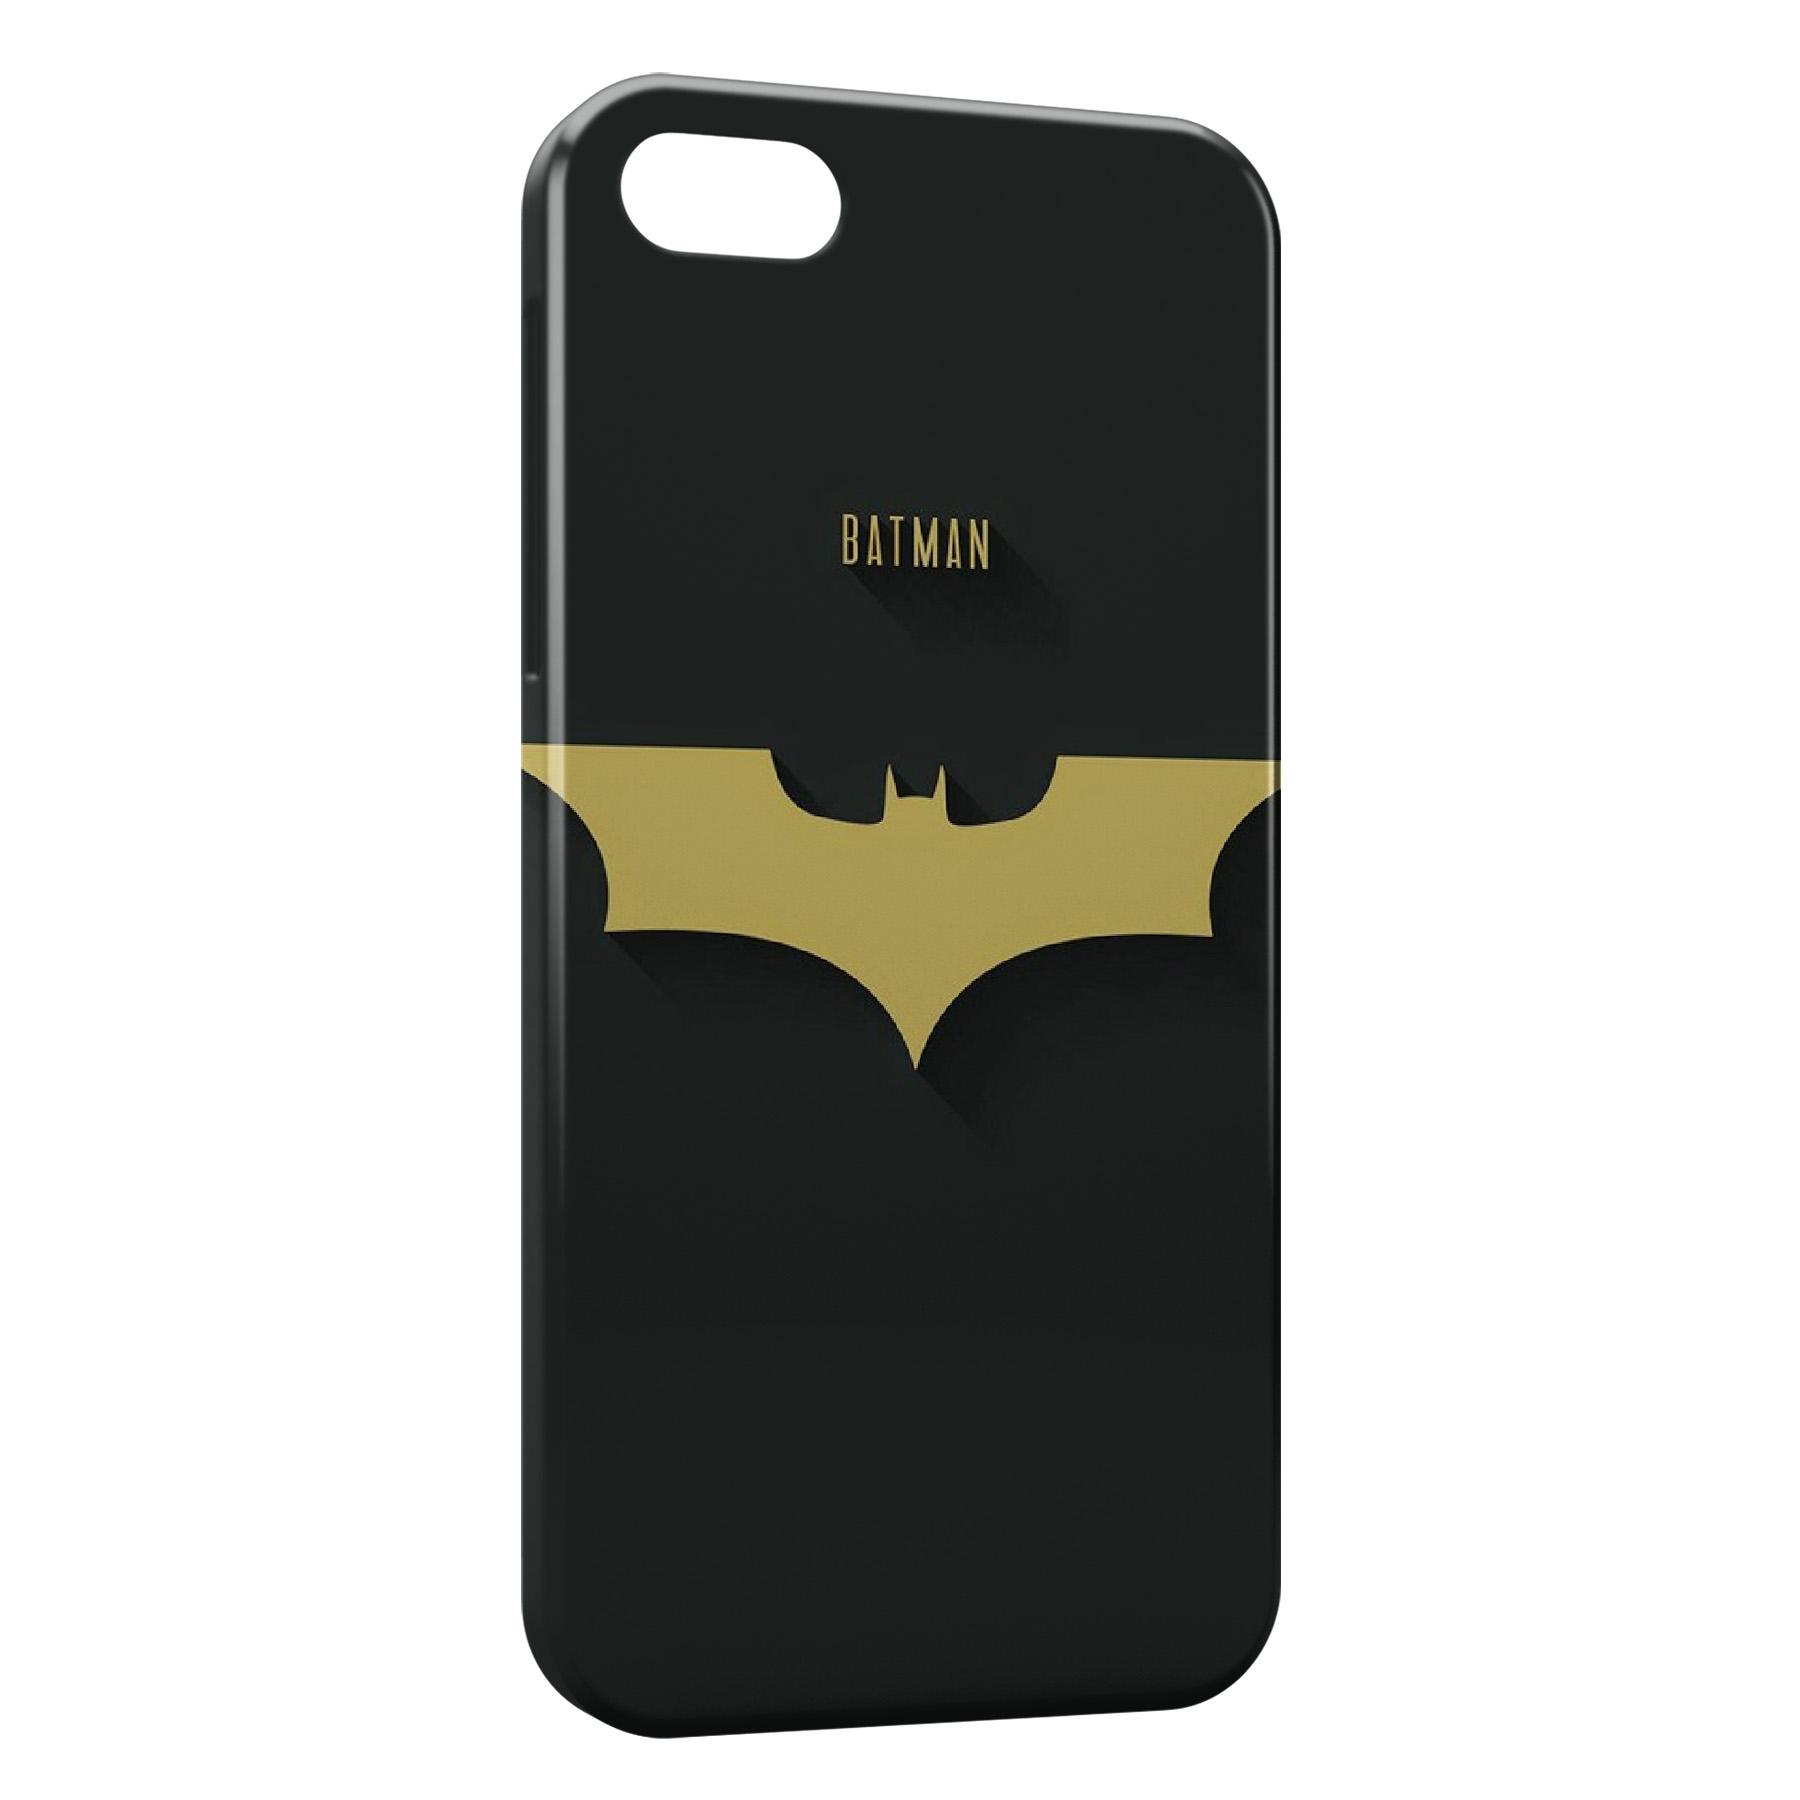 Coque iPhone 4 4S Batman Logo